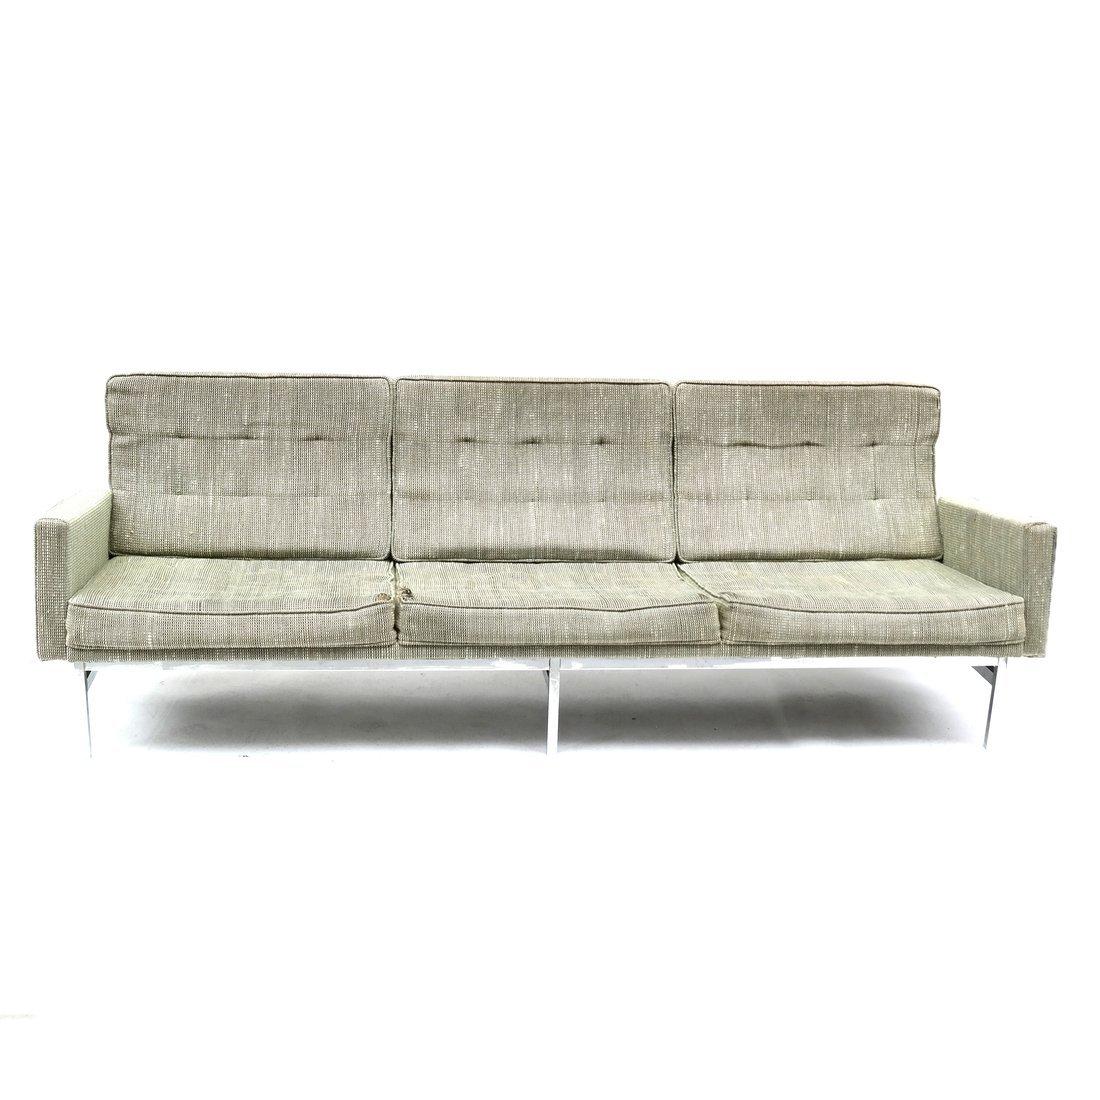 Knoll Green Upholstered Sofa